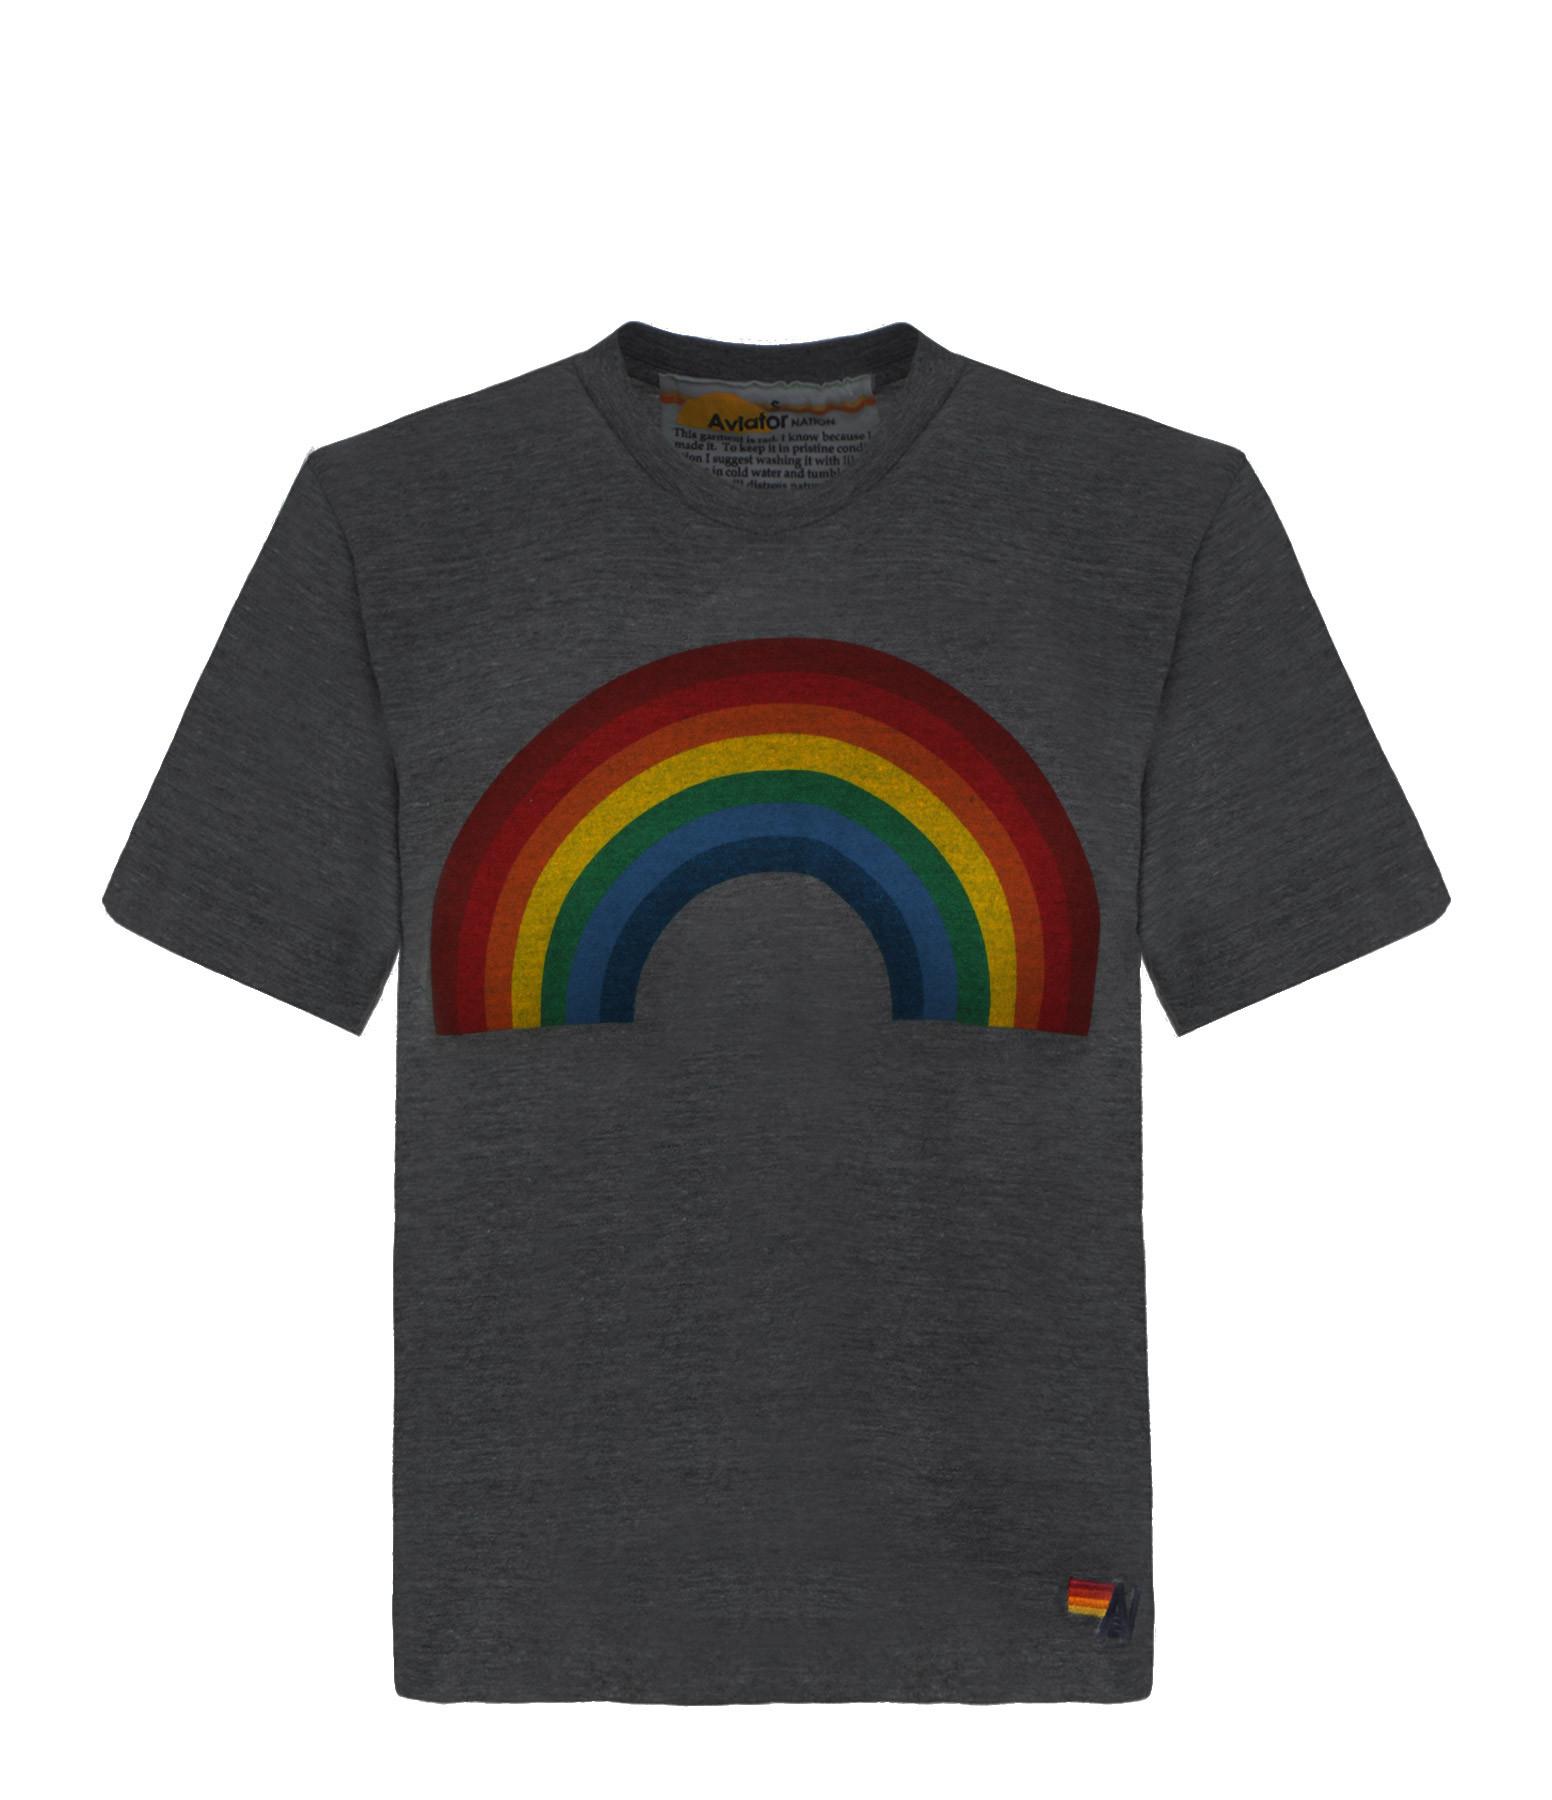 AVIATOR NATION - Tee-shirt Rainbow Charbon